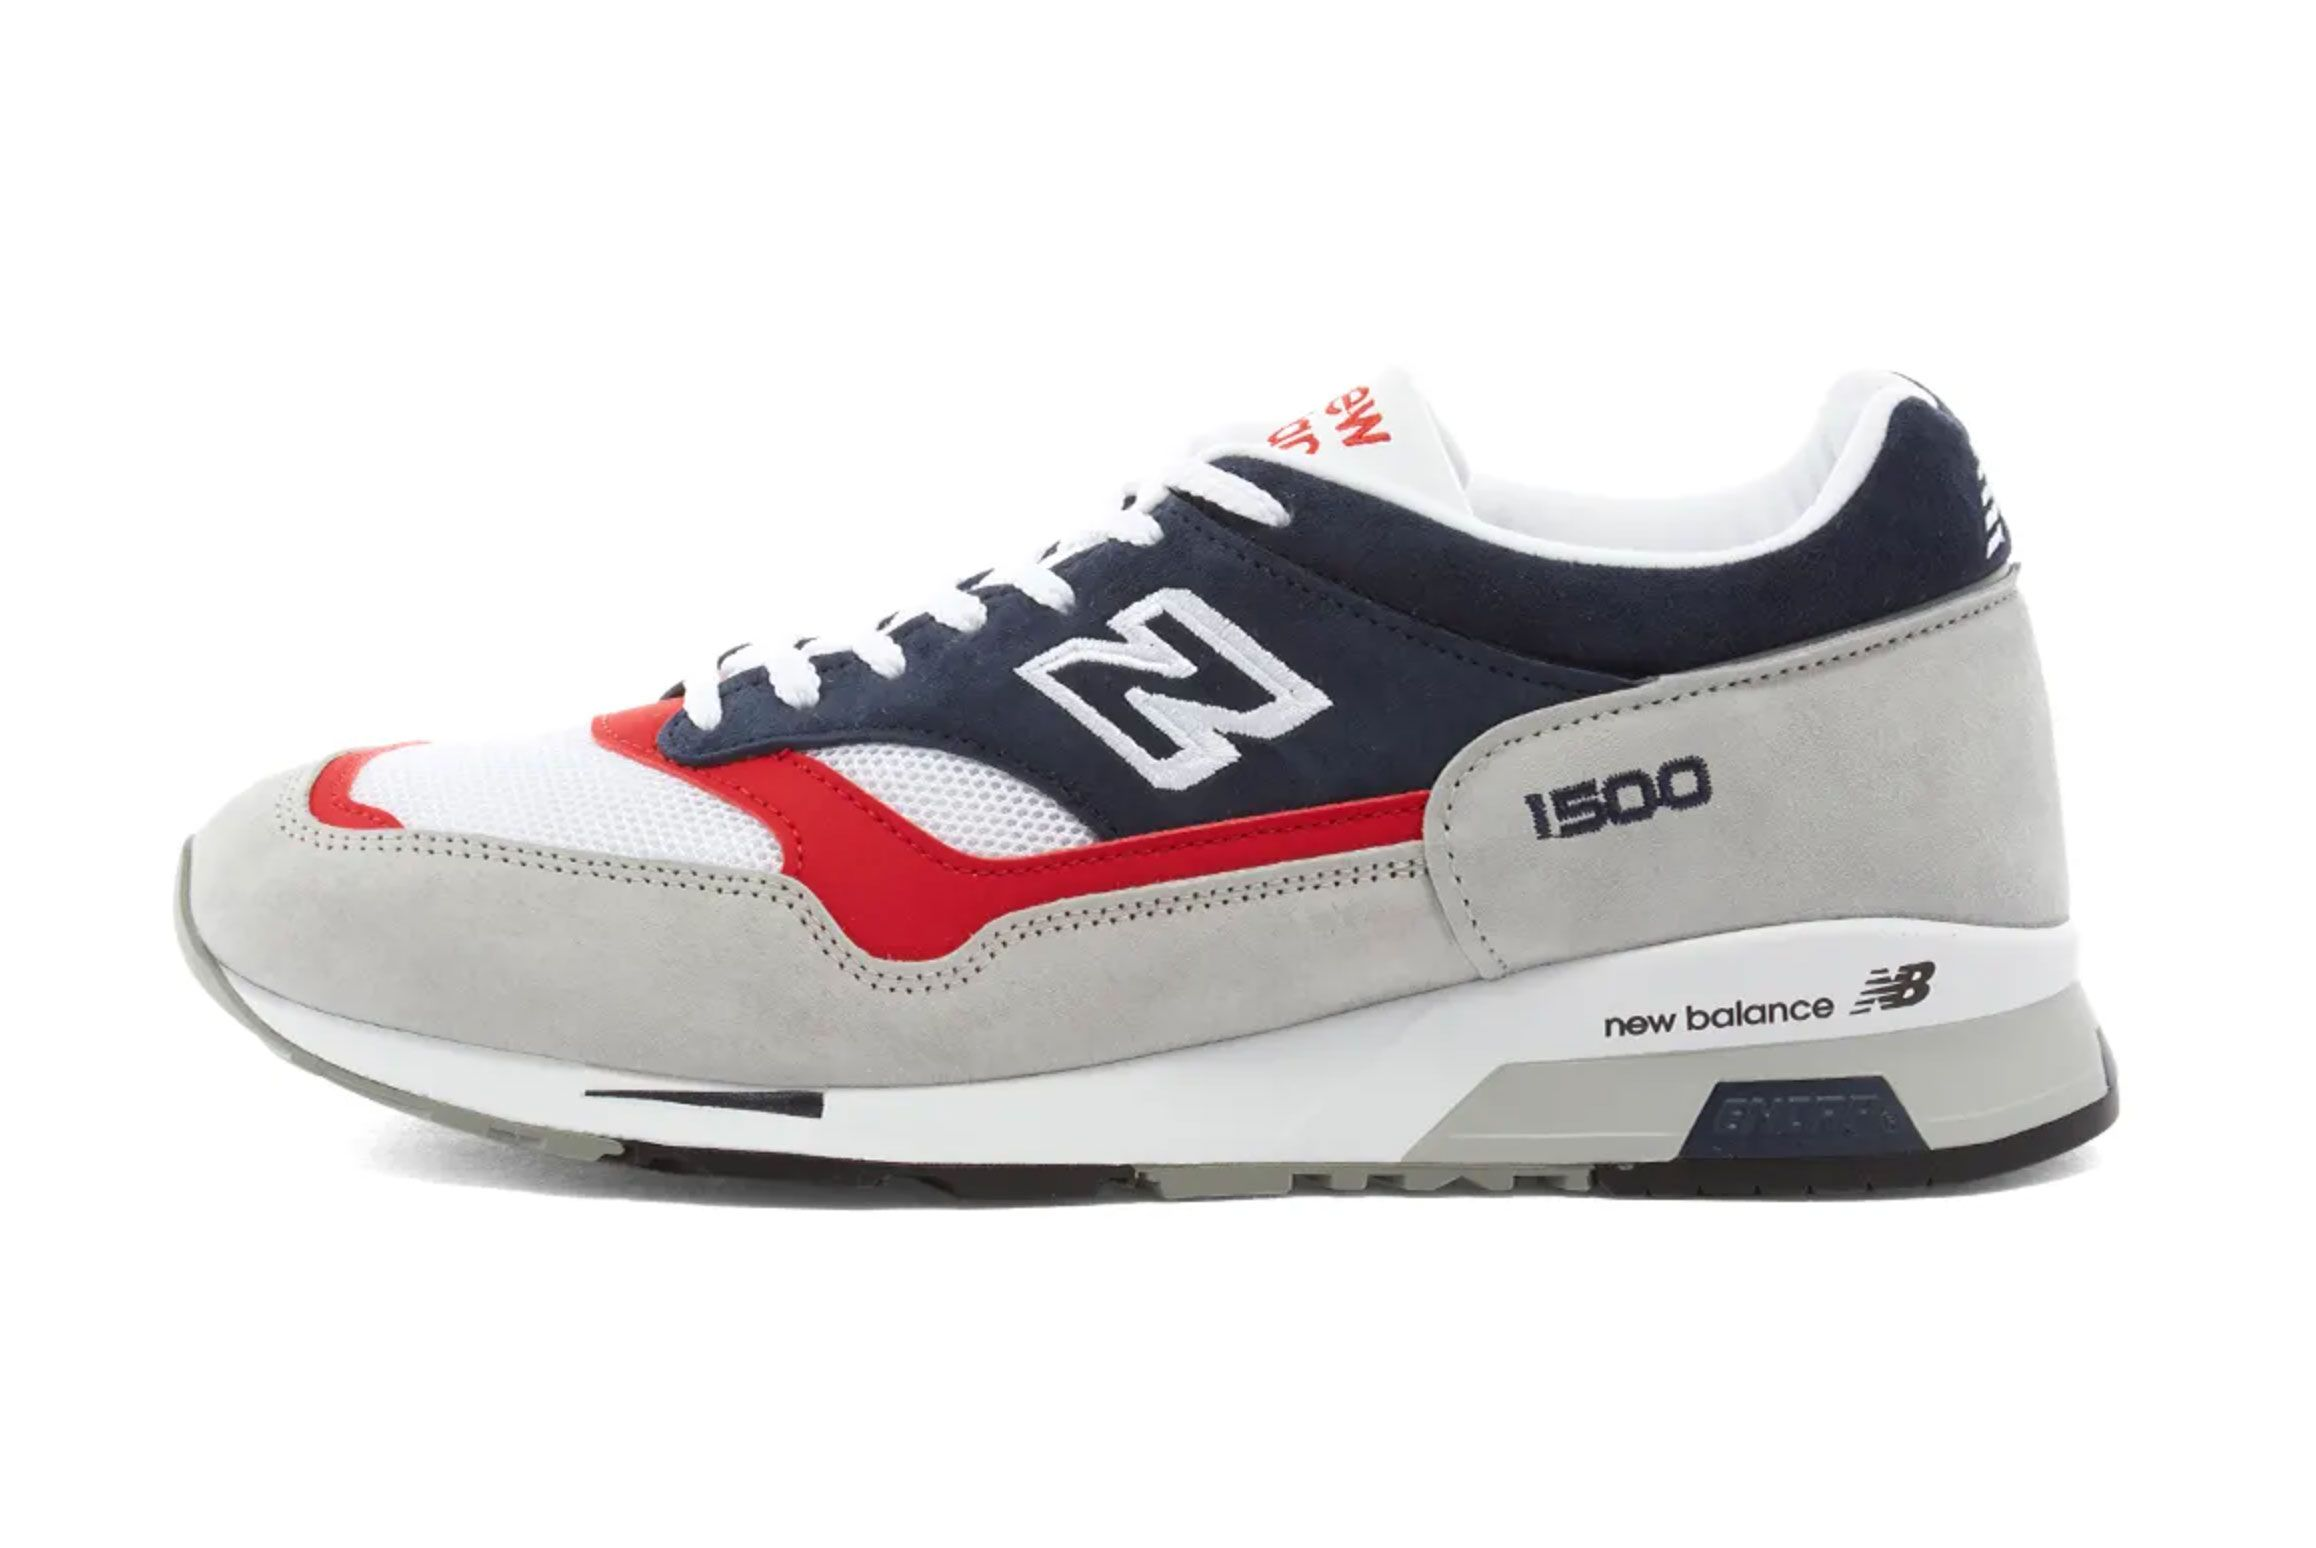 New Balance 1500 (Grey/Blue/Red)